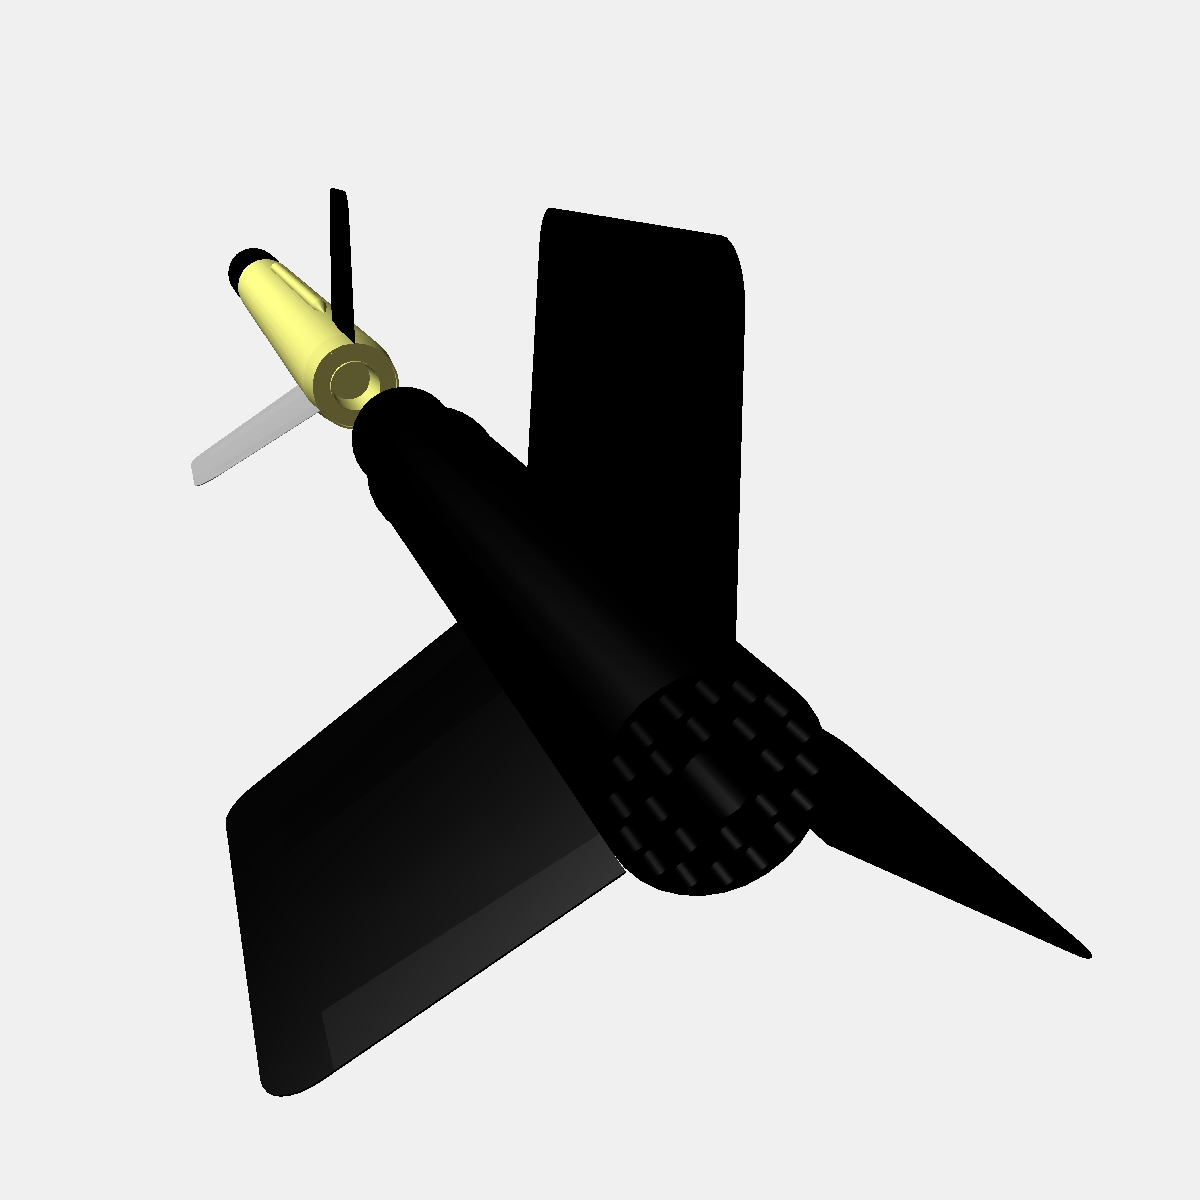 us wac corporal rocket 3d model 3ds dxf x cod scn obj 149618